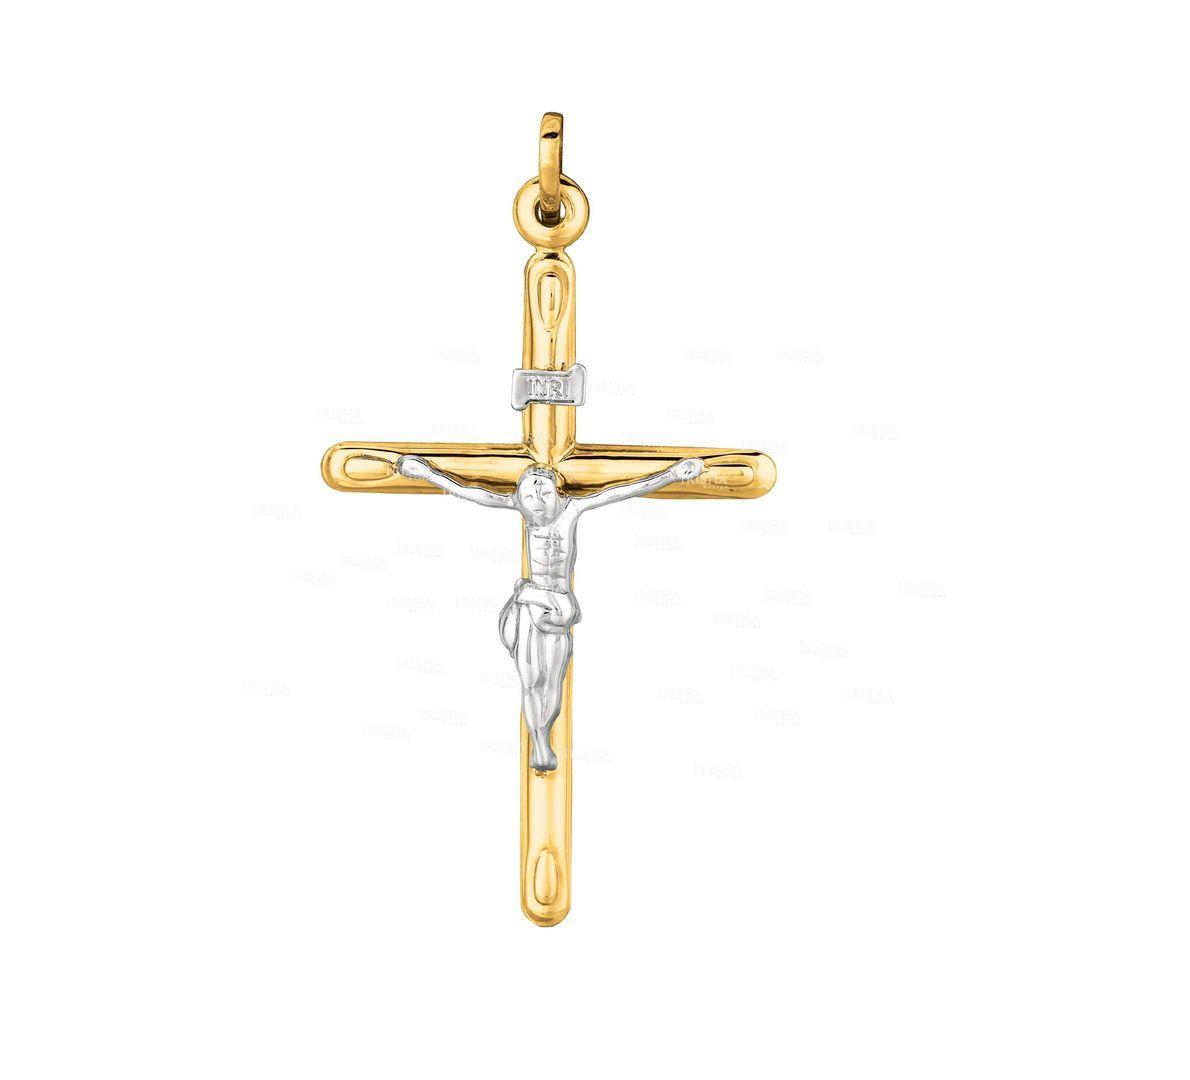 14K Yellow+White Gold Shiny Cross with White Figurine Pendant Christmas Jewelry